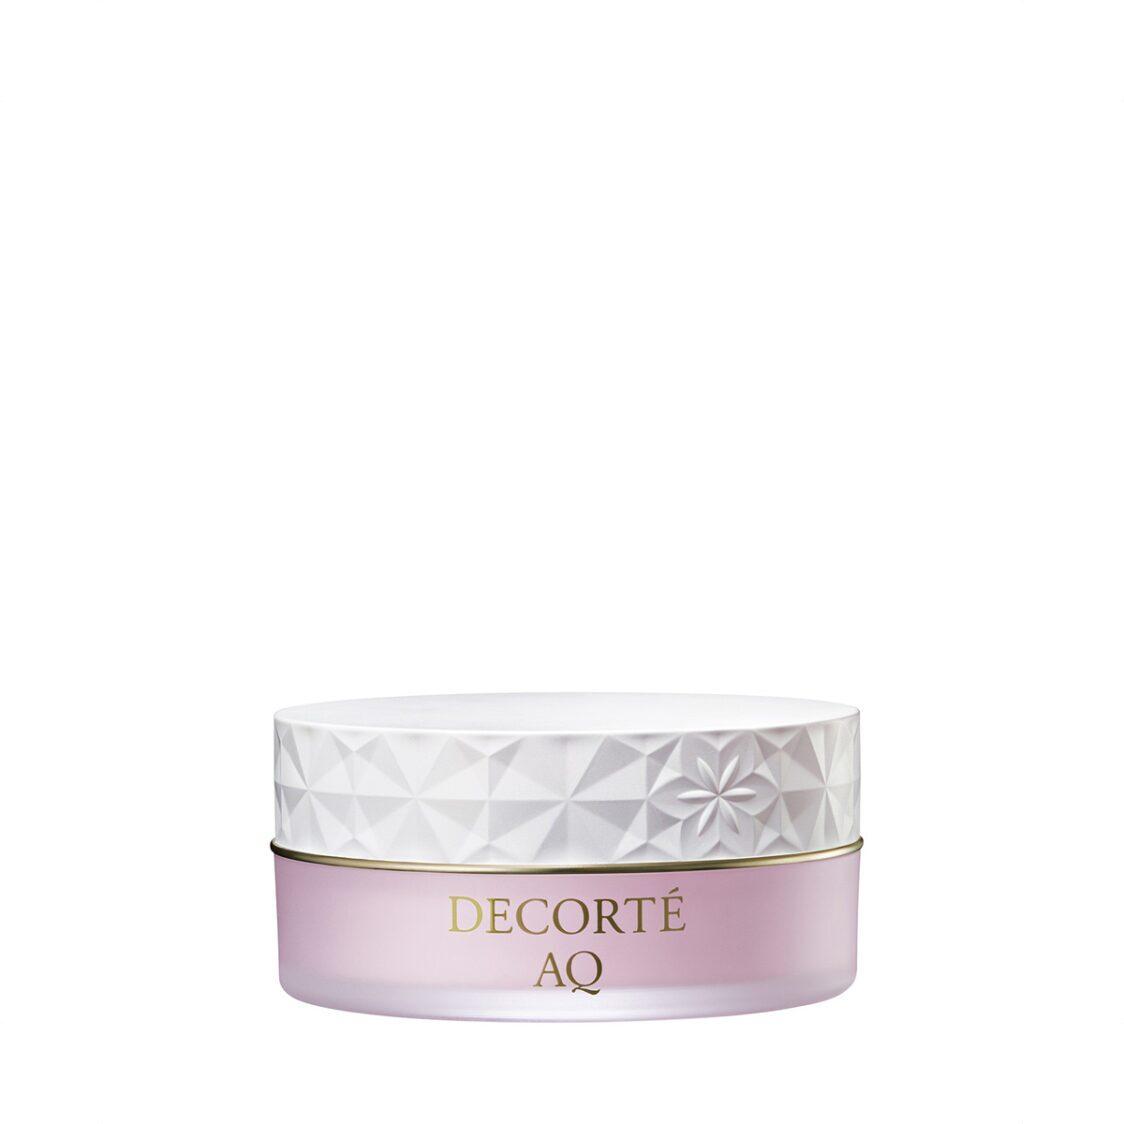 Decorte AQ Translucent Veil Facial Powder